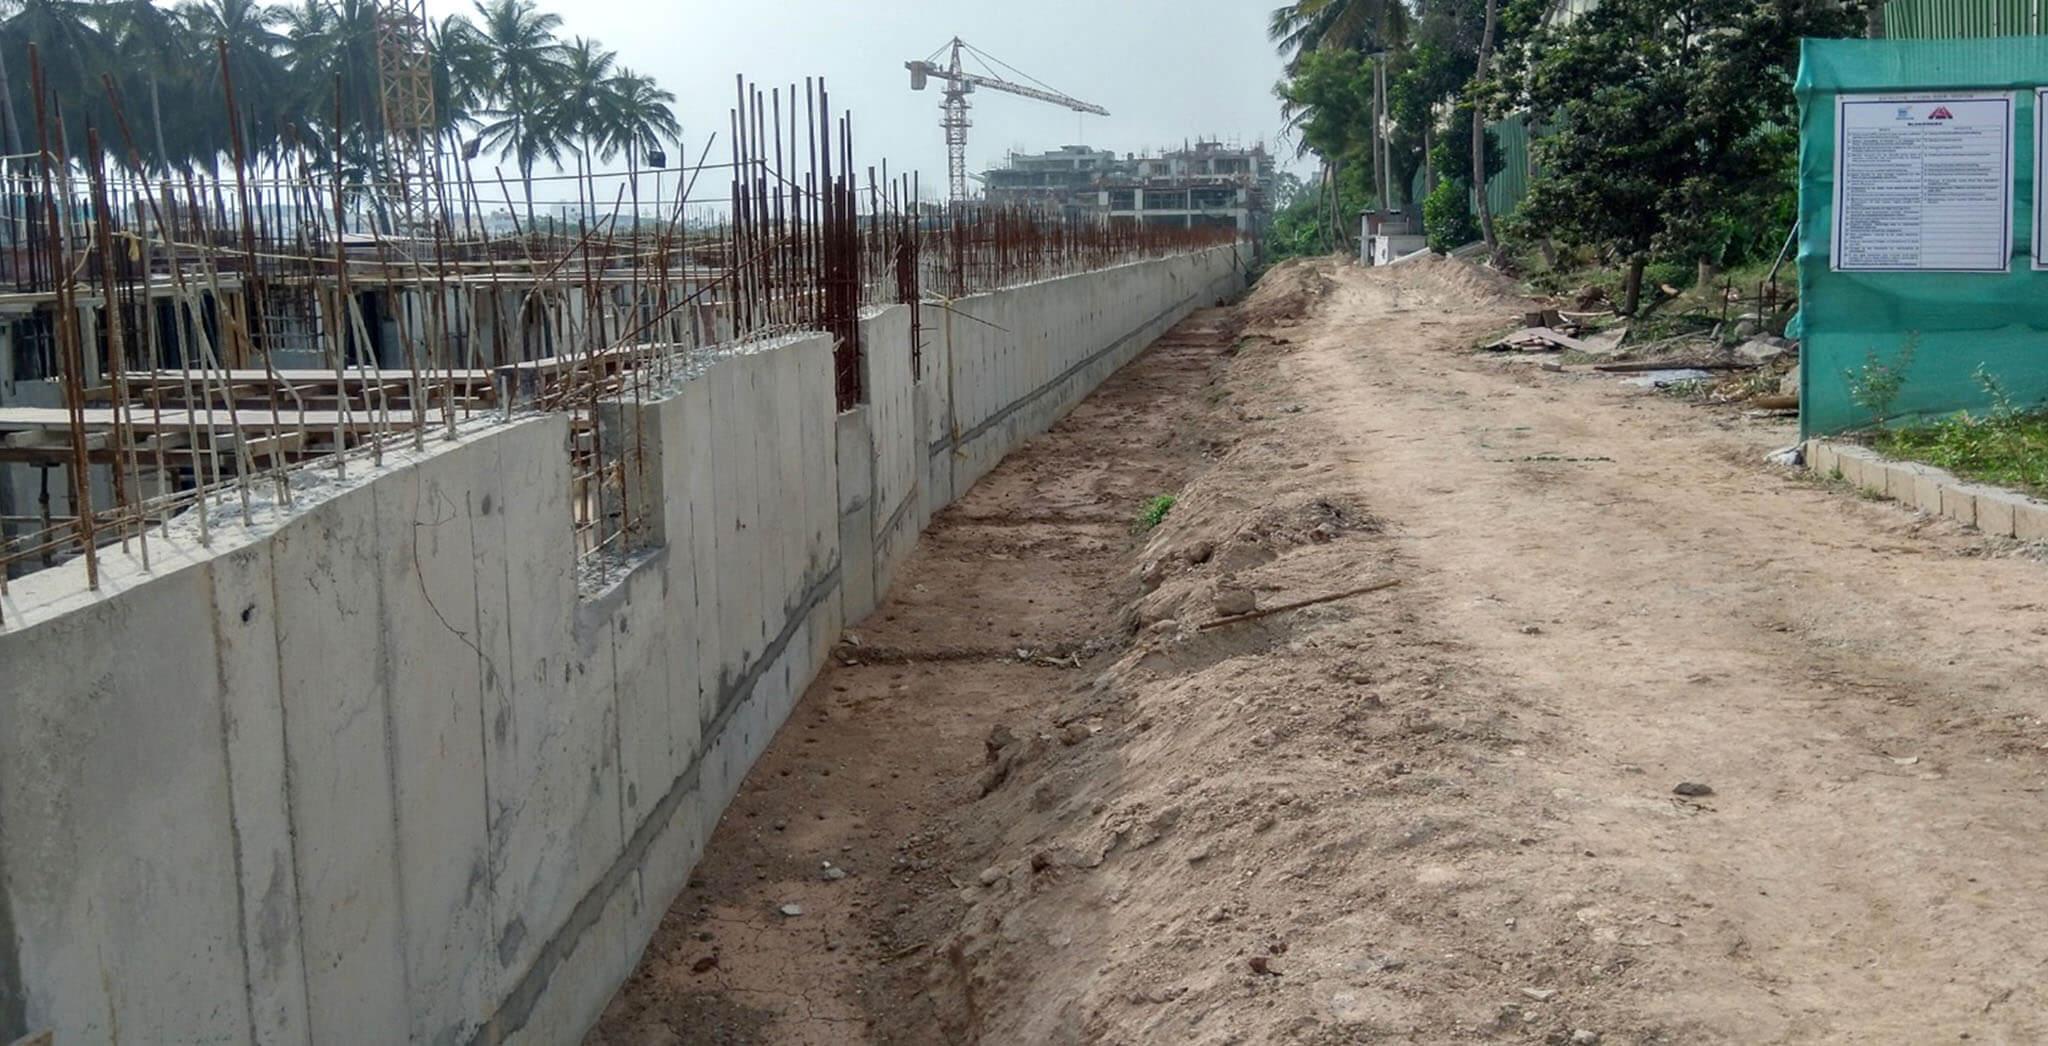 Jan 2020 - Retaining wall on north side work-in-progress.